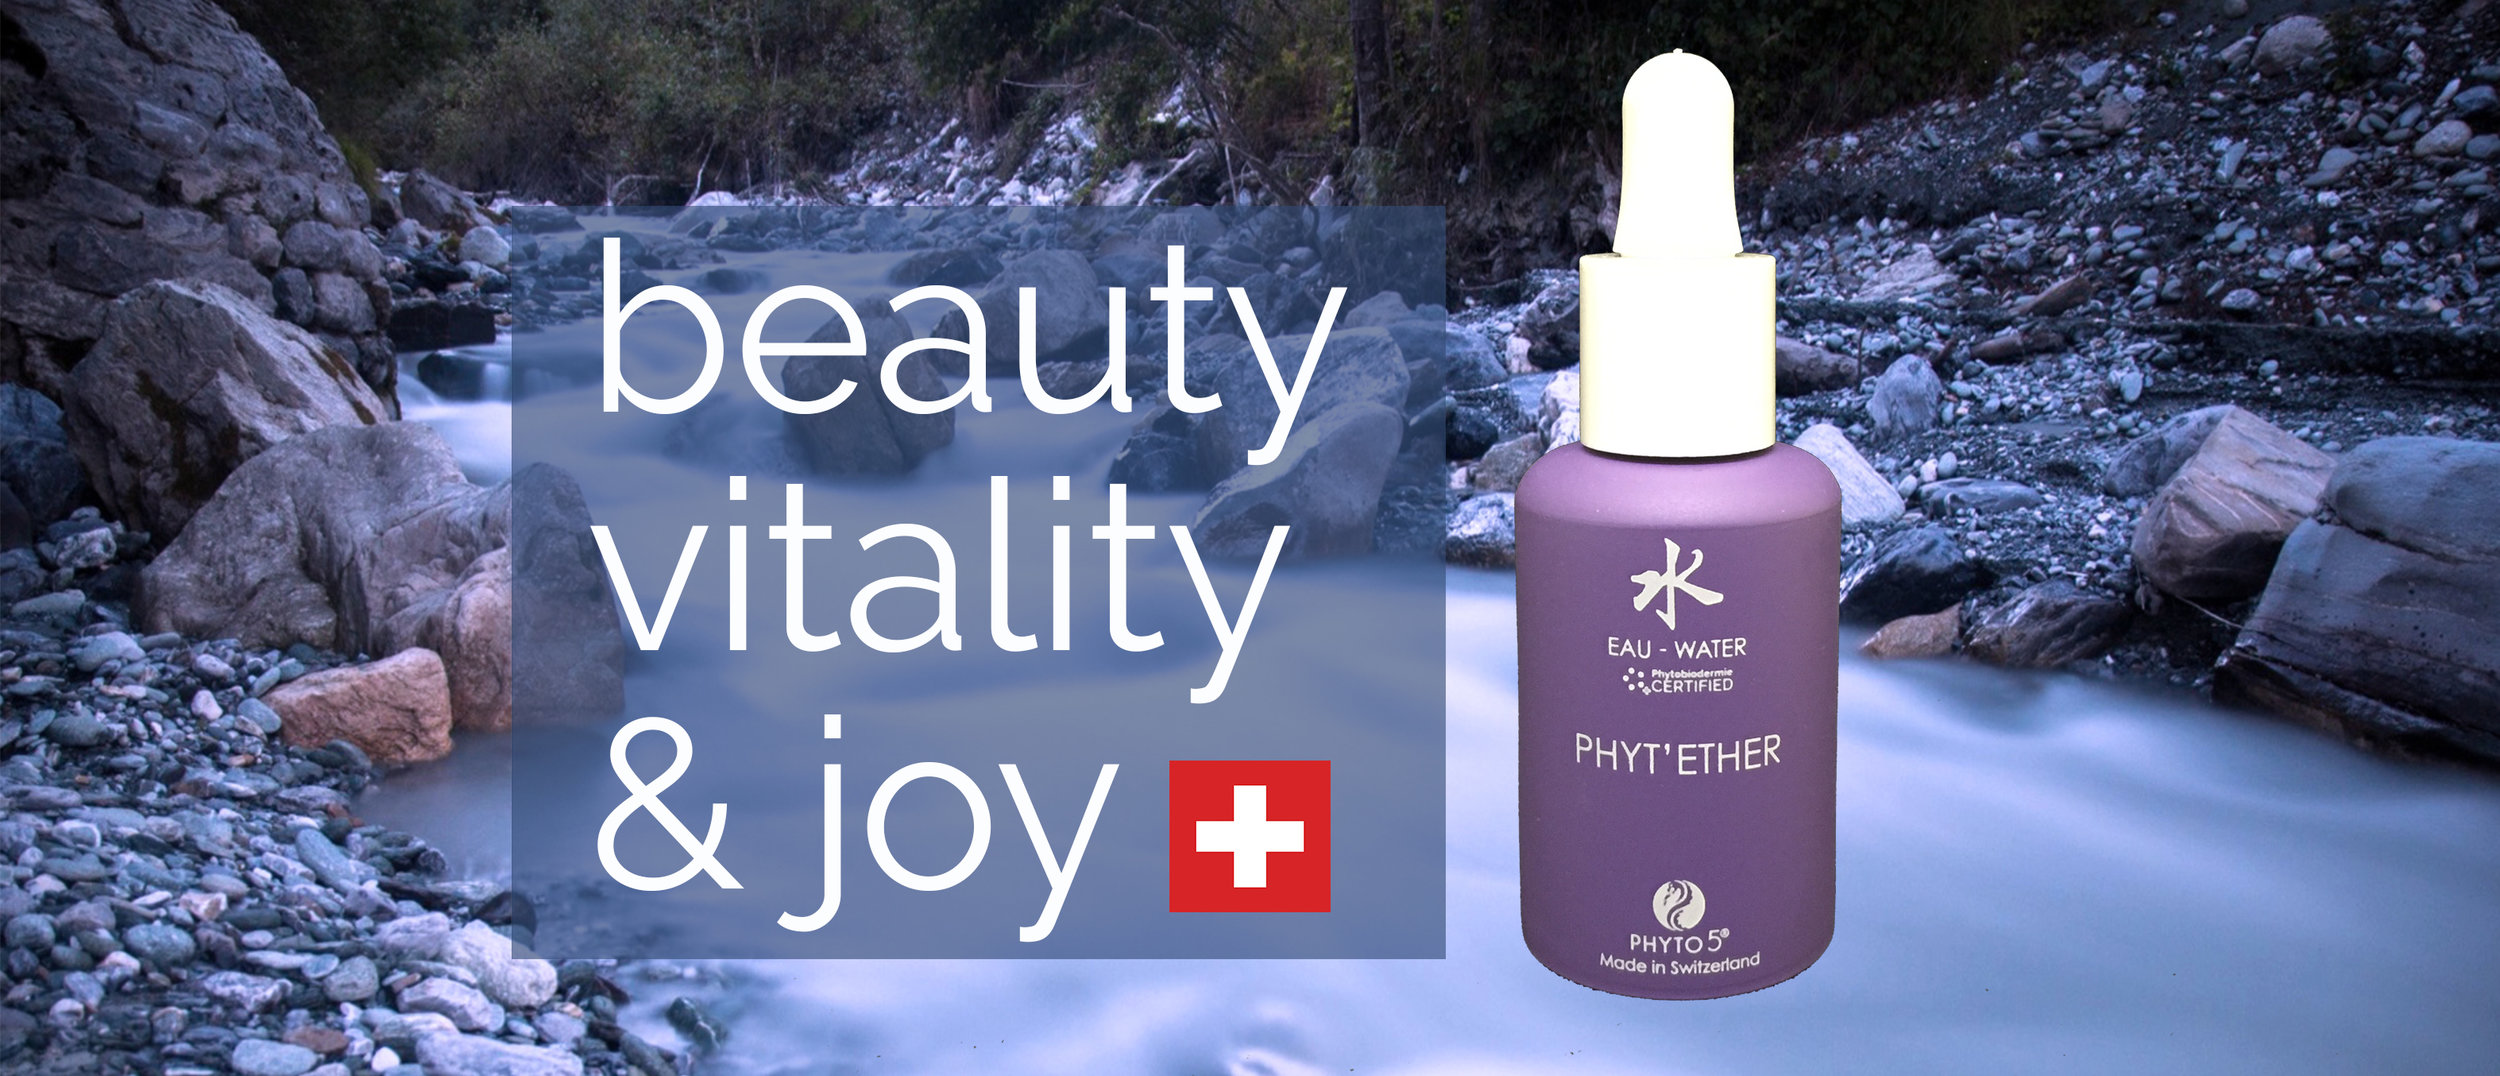 phyto5-beauty-vitality-joy-banner.jpg